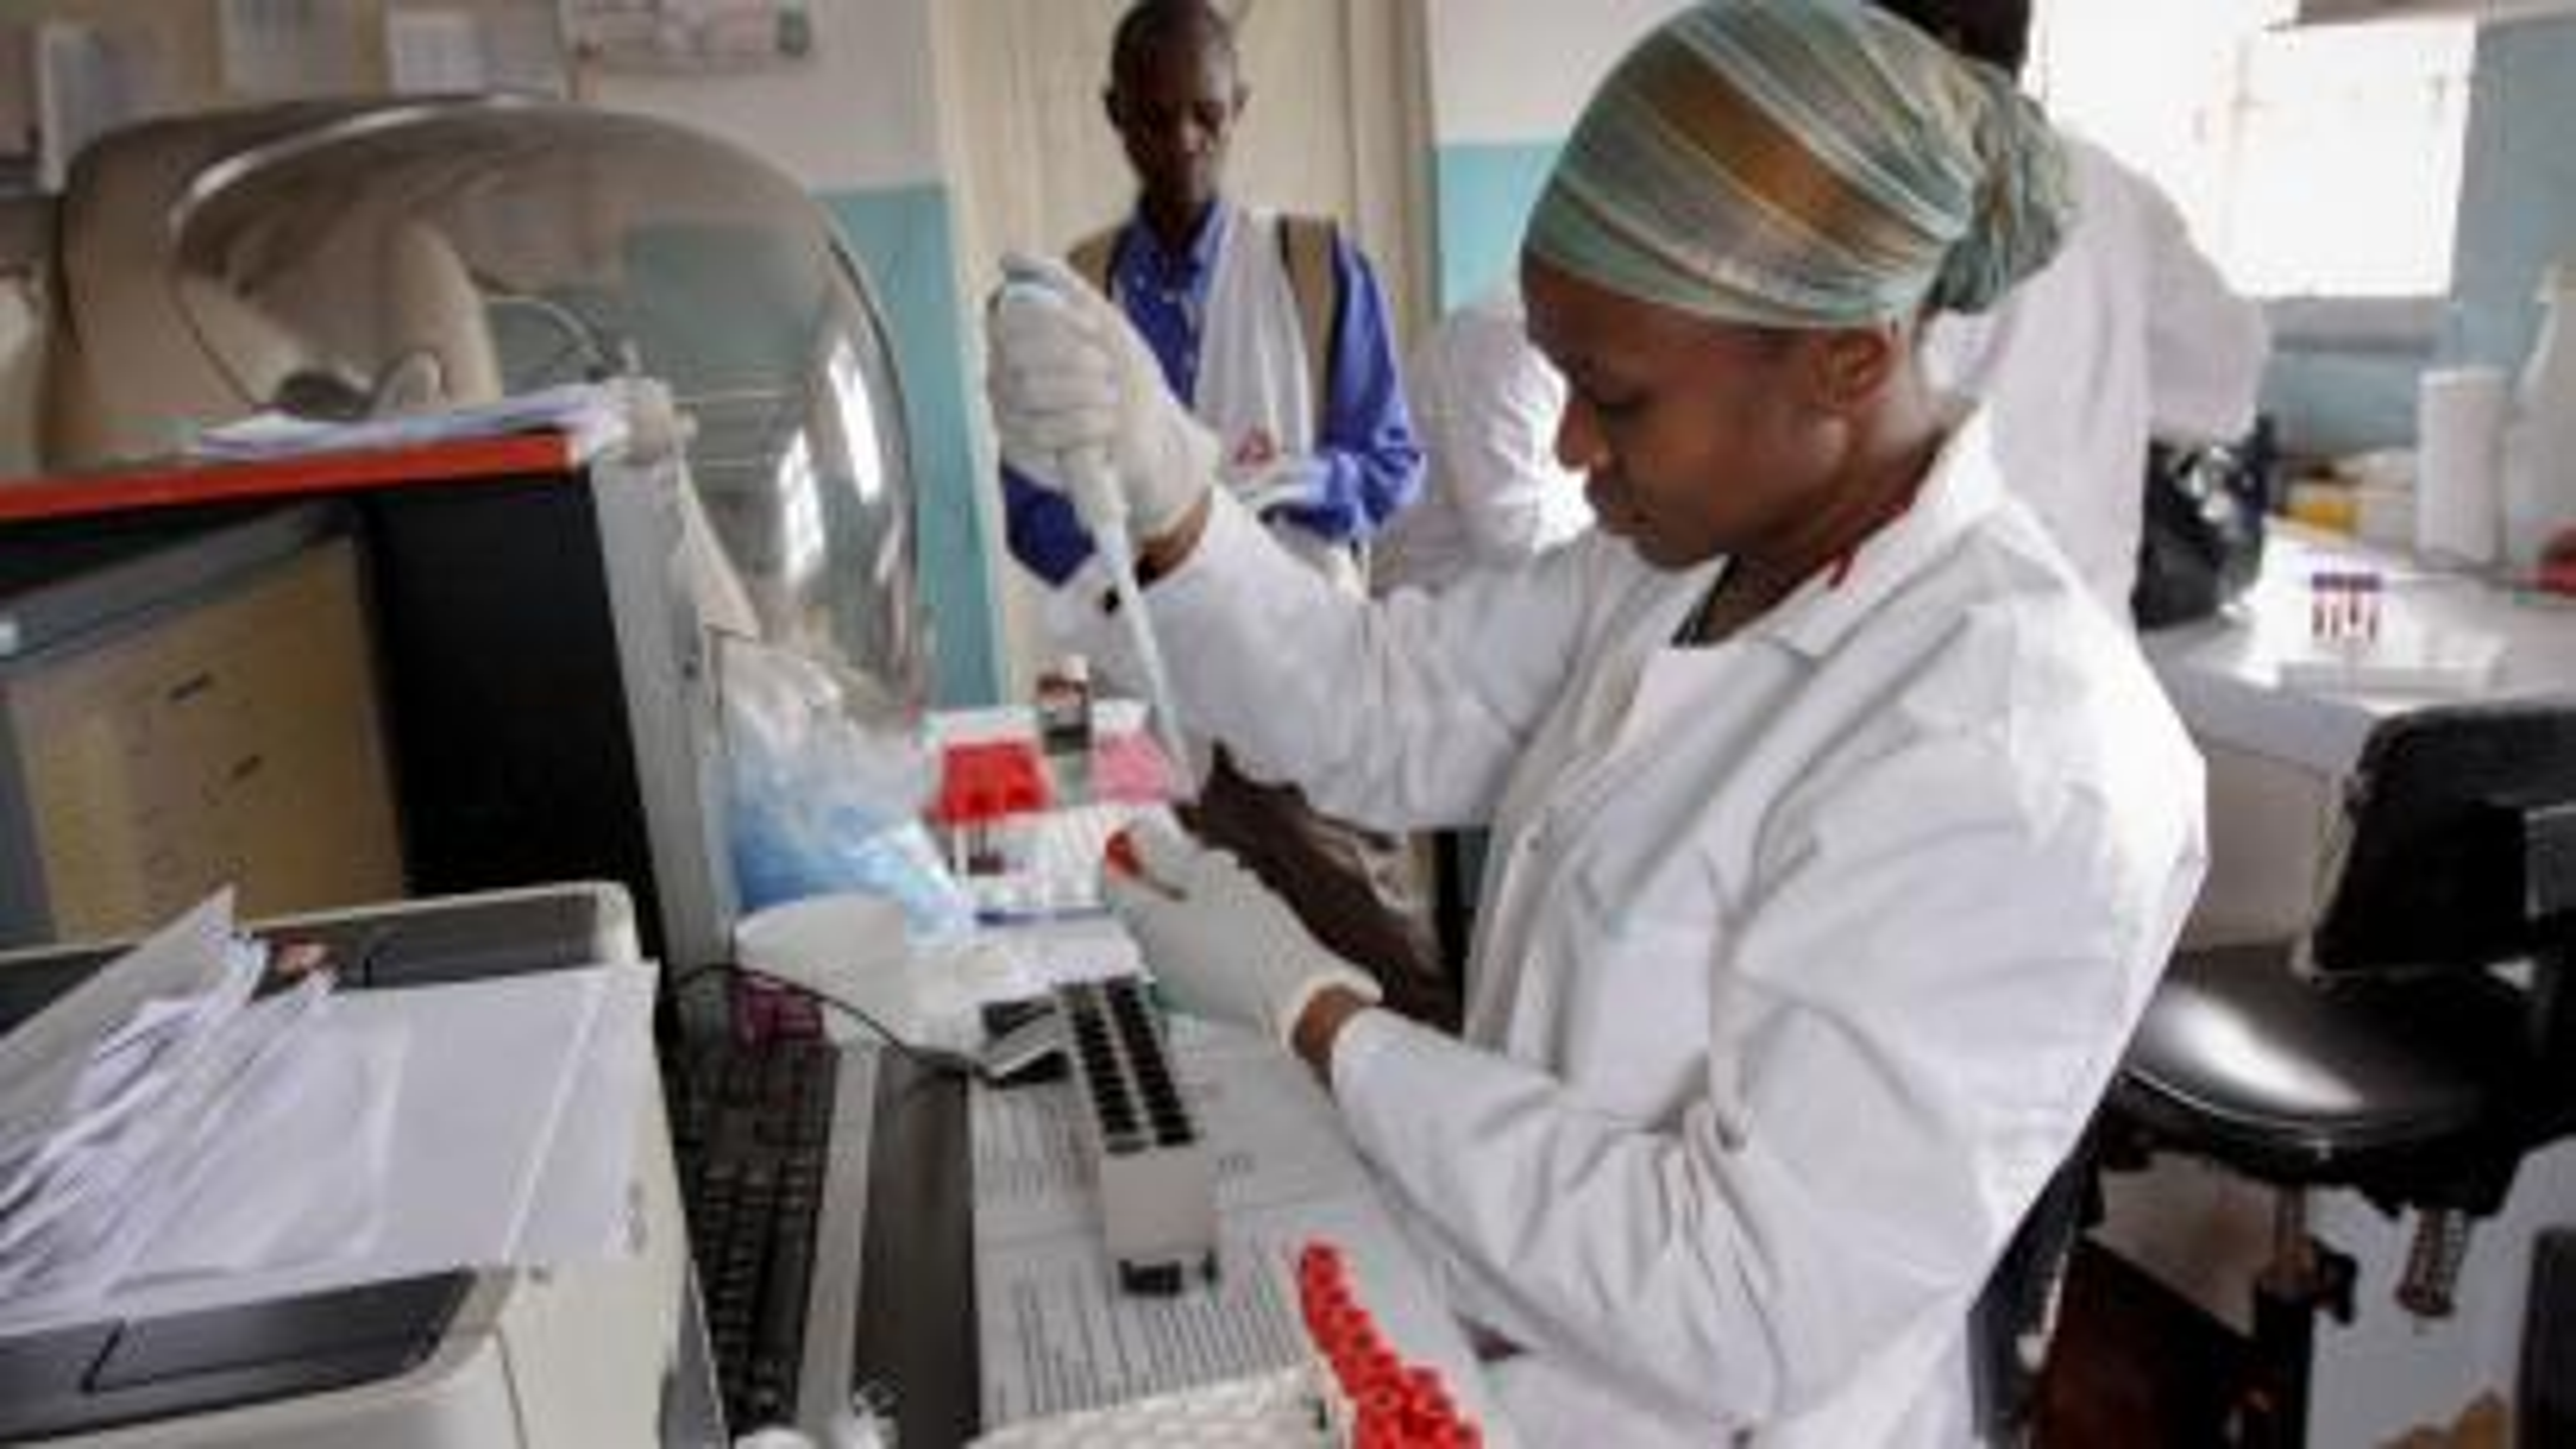 scientists african nairobi hiv ap continent every africa kenya health healthcare leaving senosi khalil data